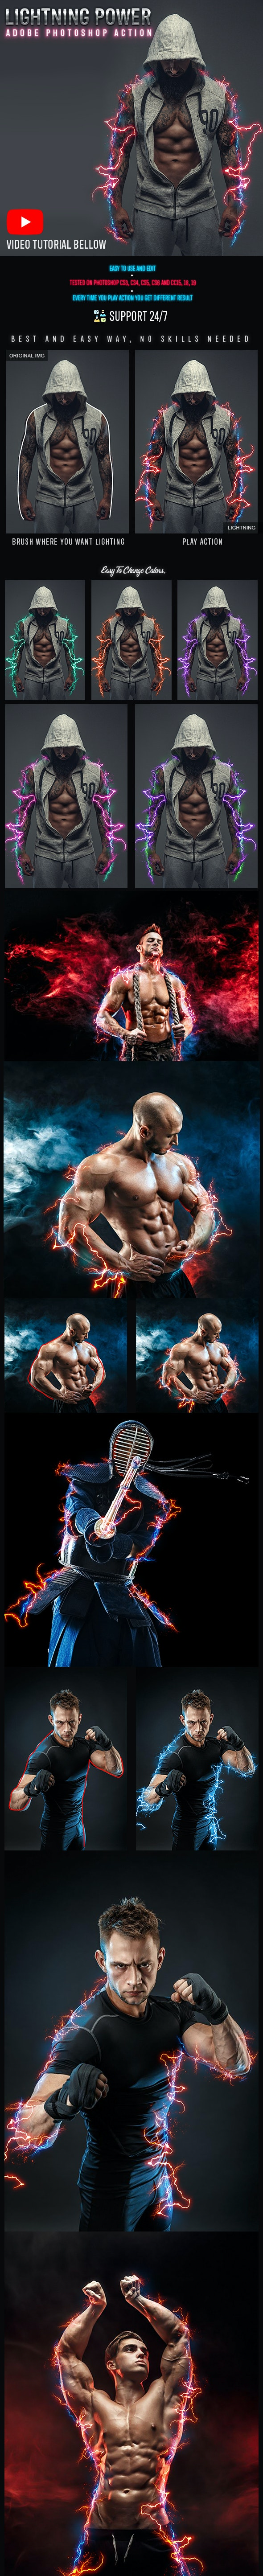 Lightning Power Photoshop Action - Actions Photoshop